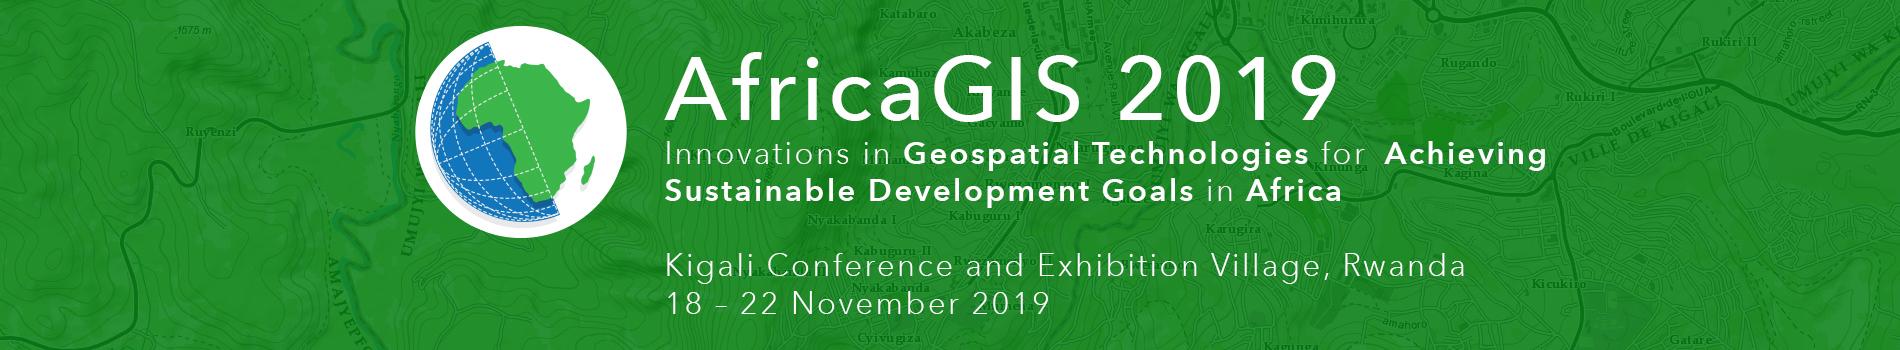 AfricaGIS 2019 Conference in Kigali Rwanda 18 - 22 November 2019